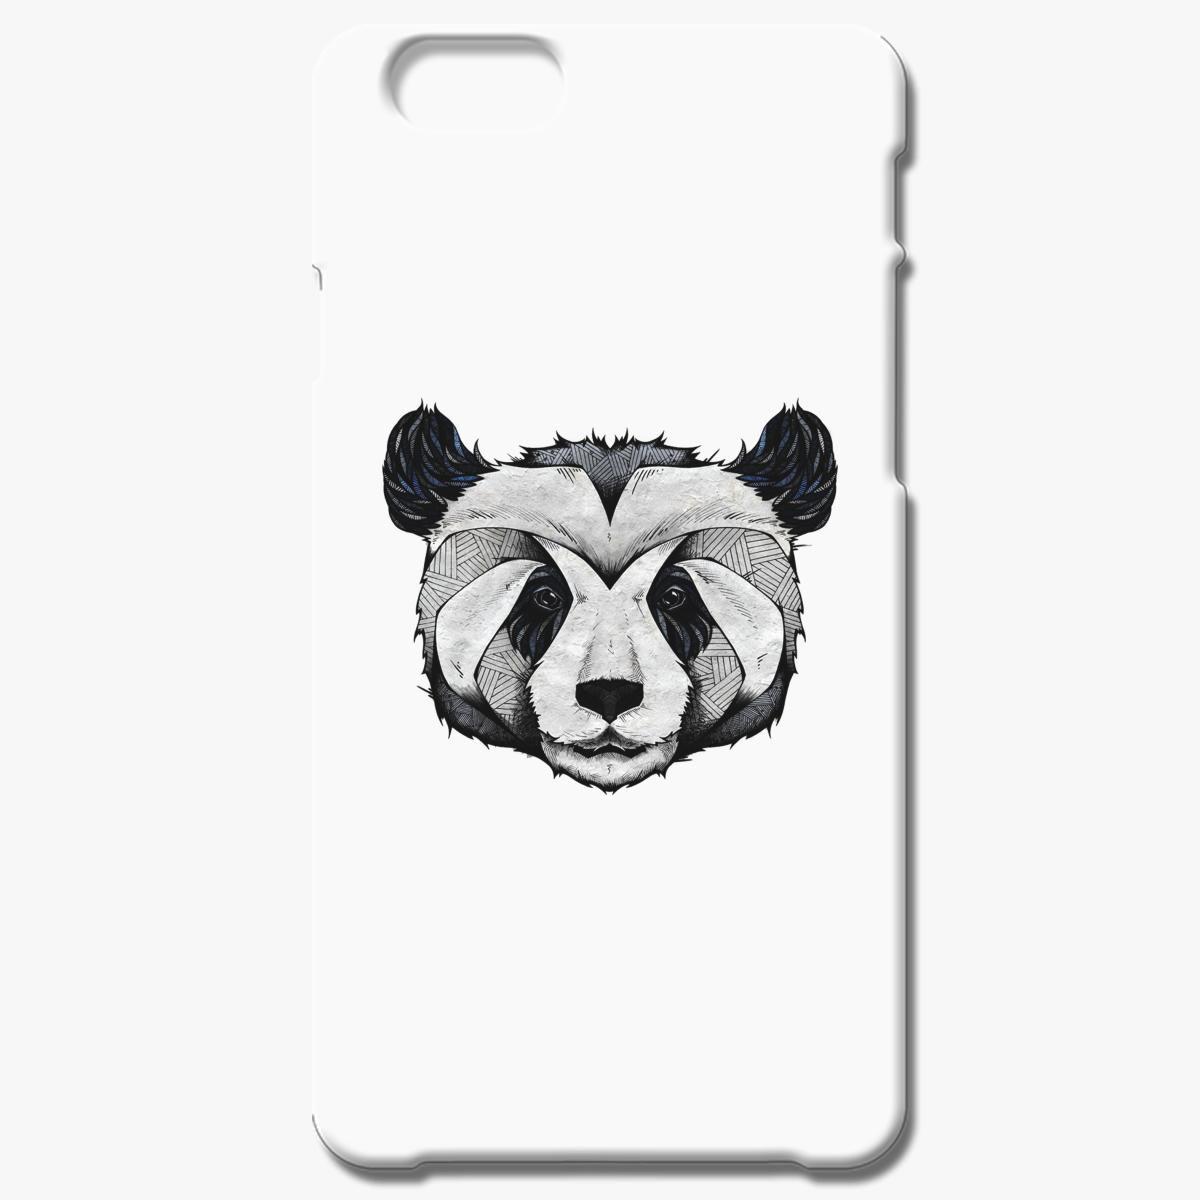 Panda Bear Chi Iphone 6 6s Plus Case